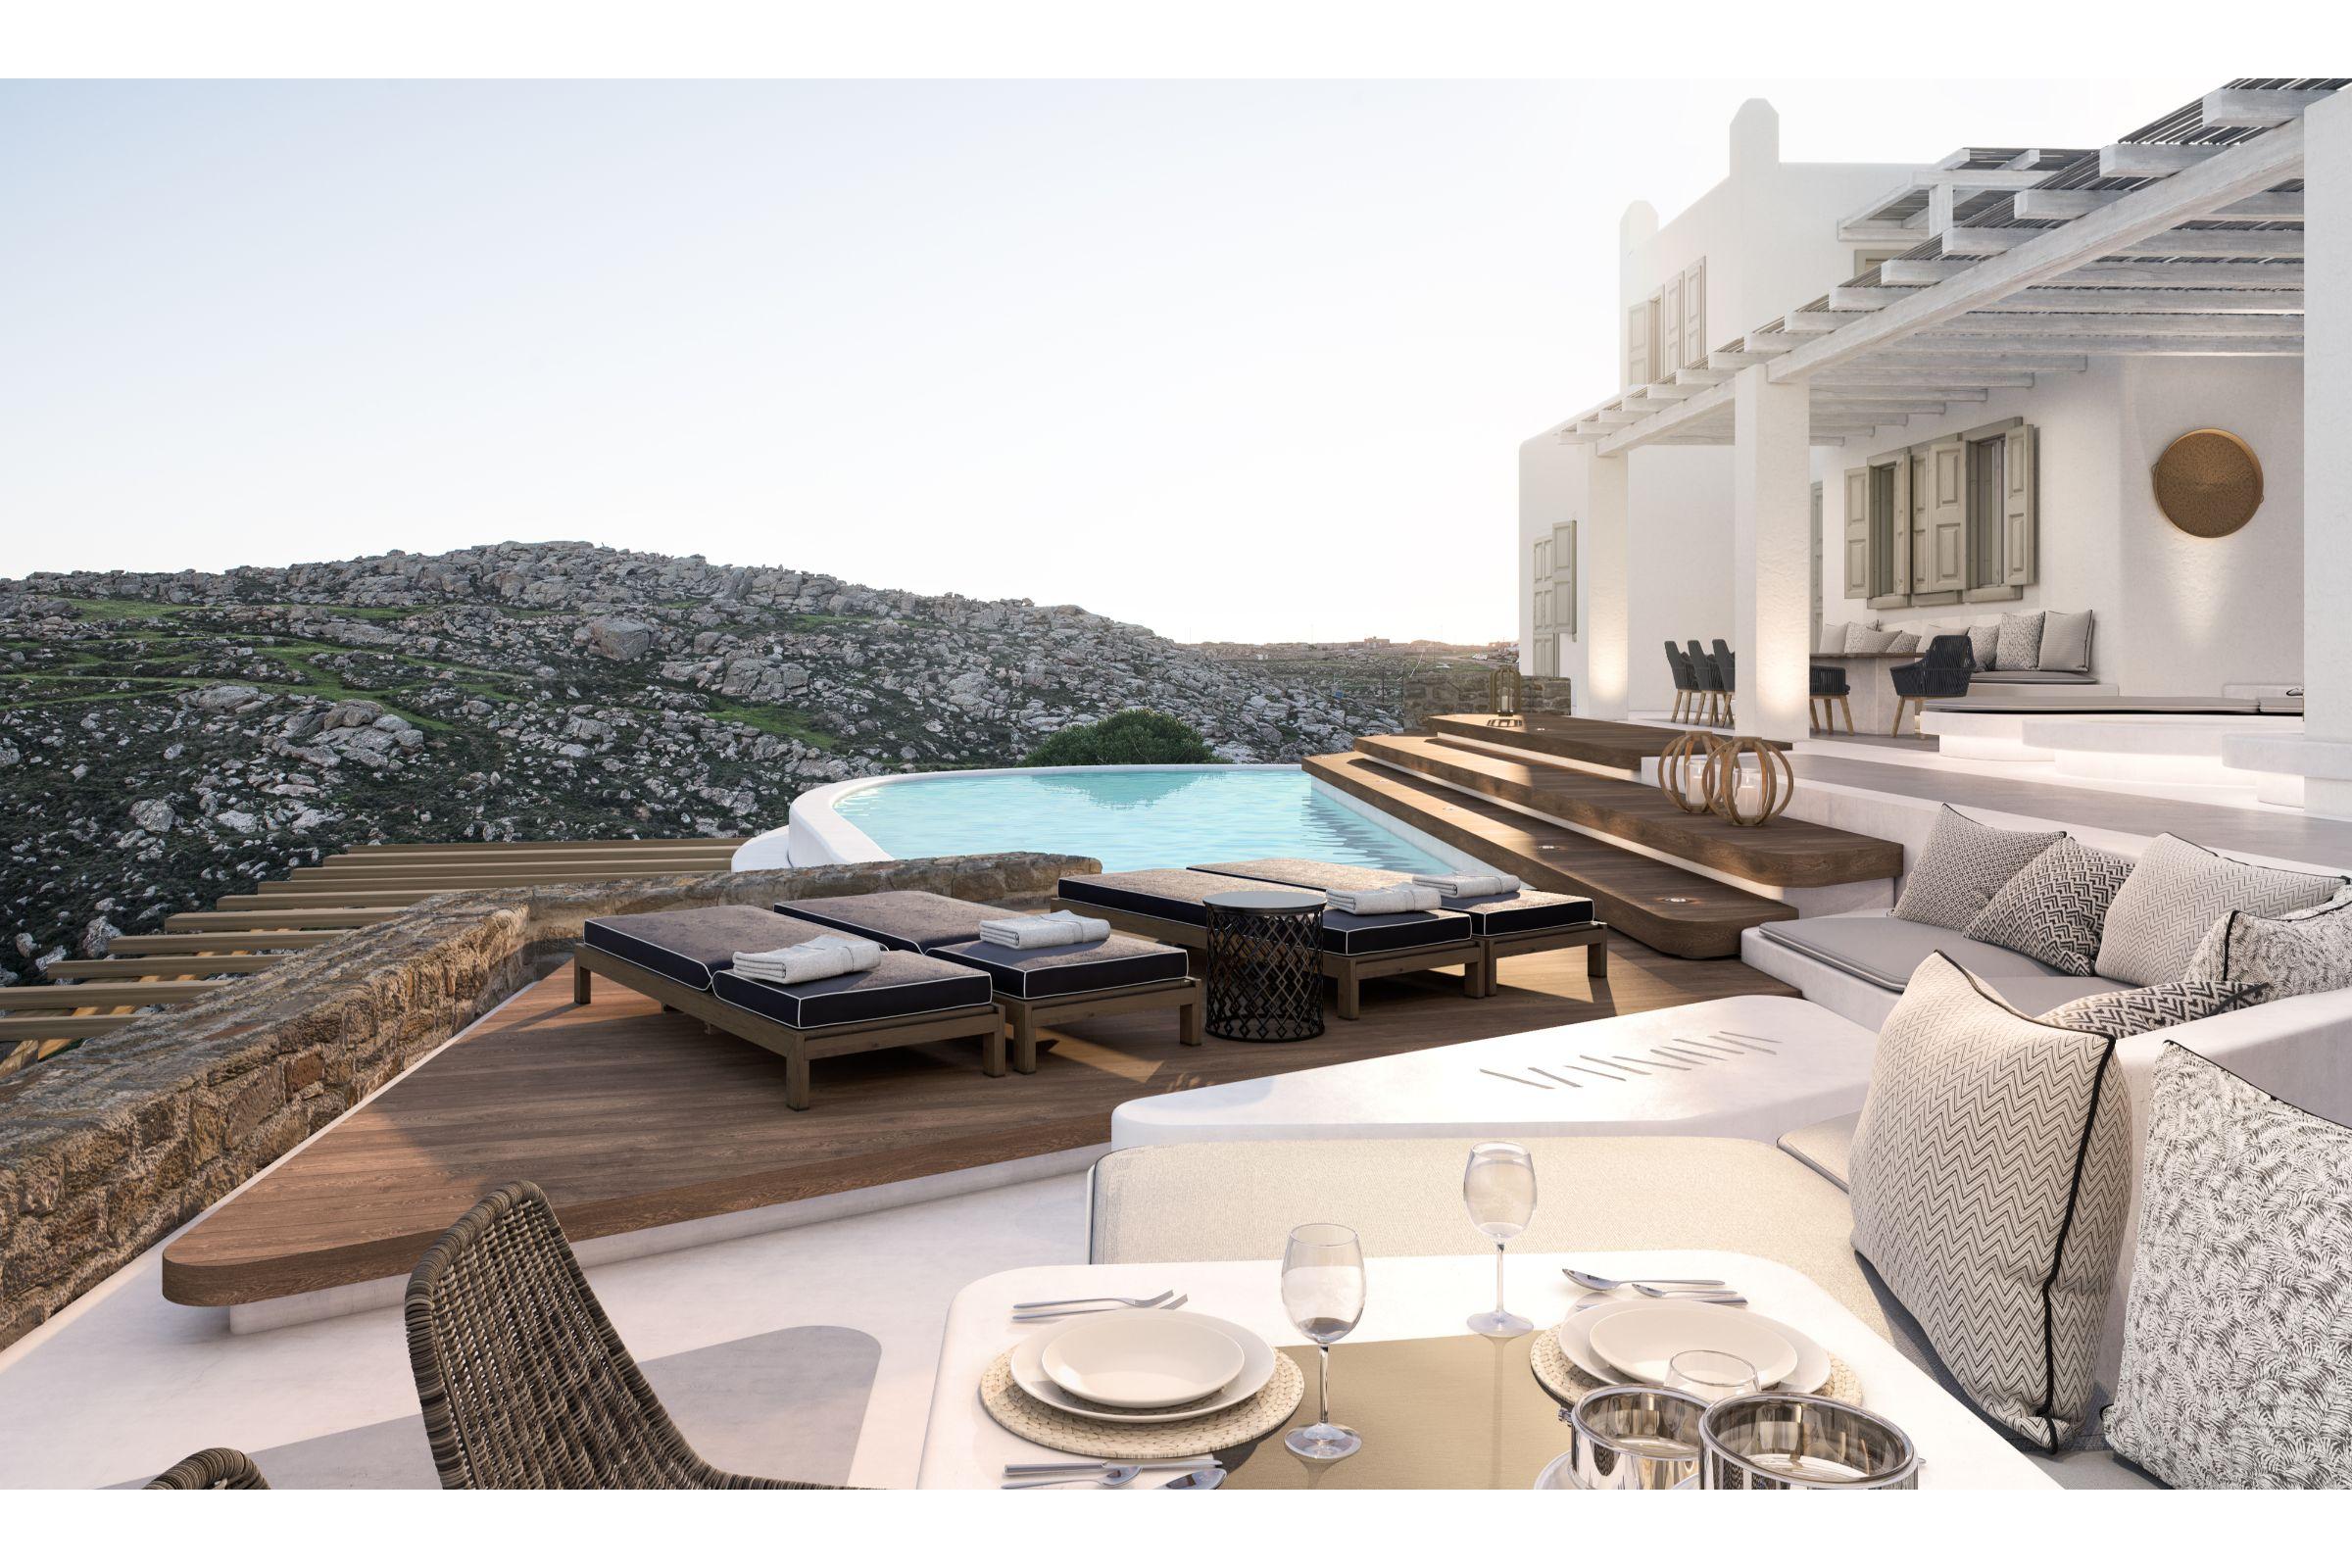 villa agrari rocks pool